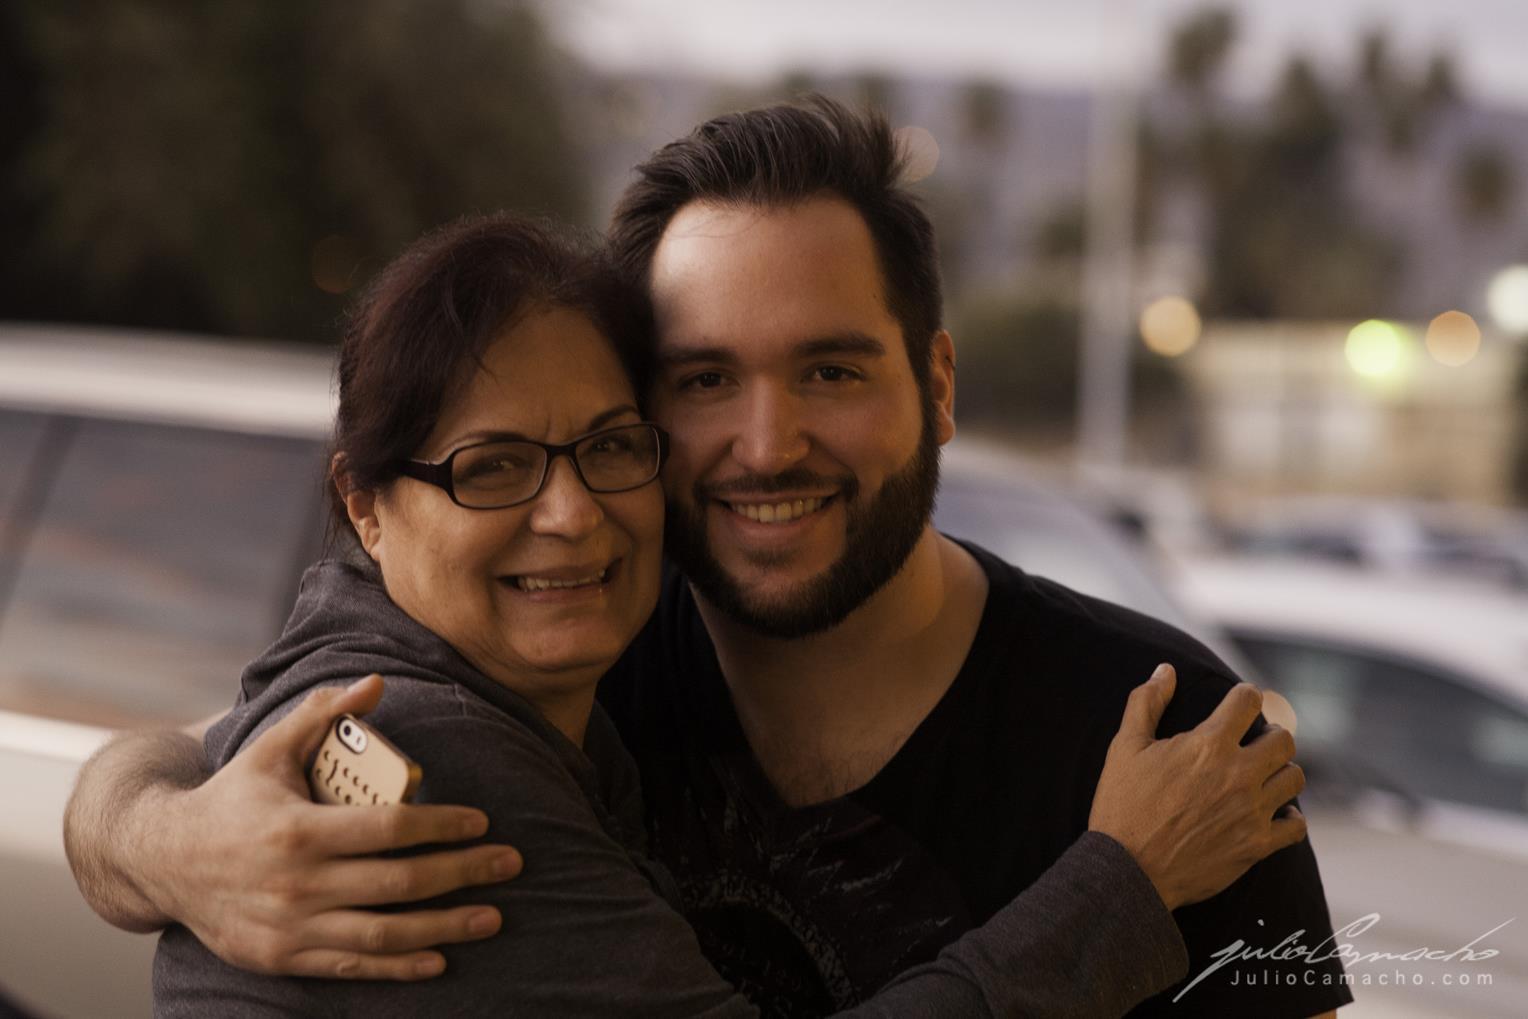 2014-10-30 31 CAST TOUR Ensenada y Tijuana - 0434 - www.Juli (Copy).jpg